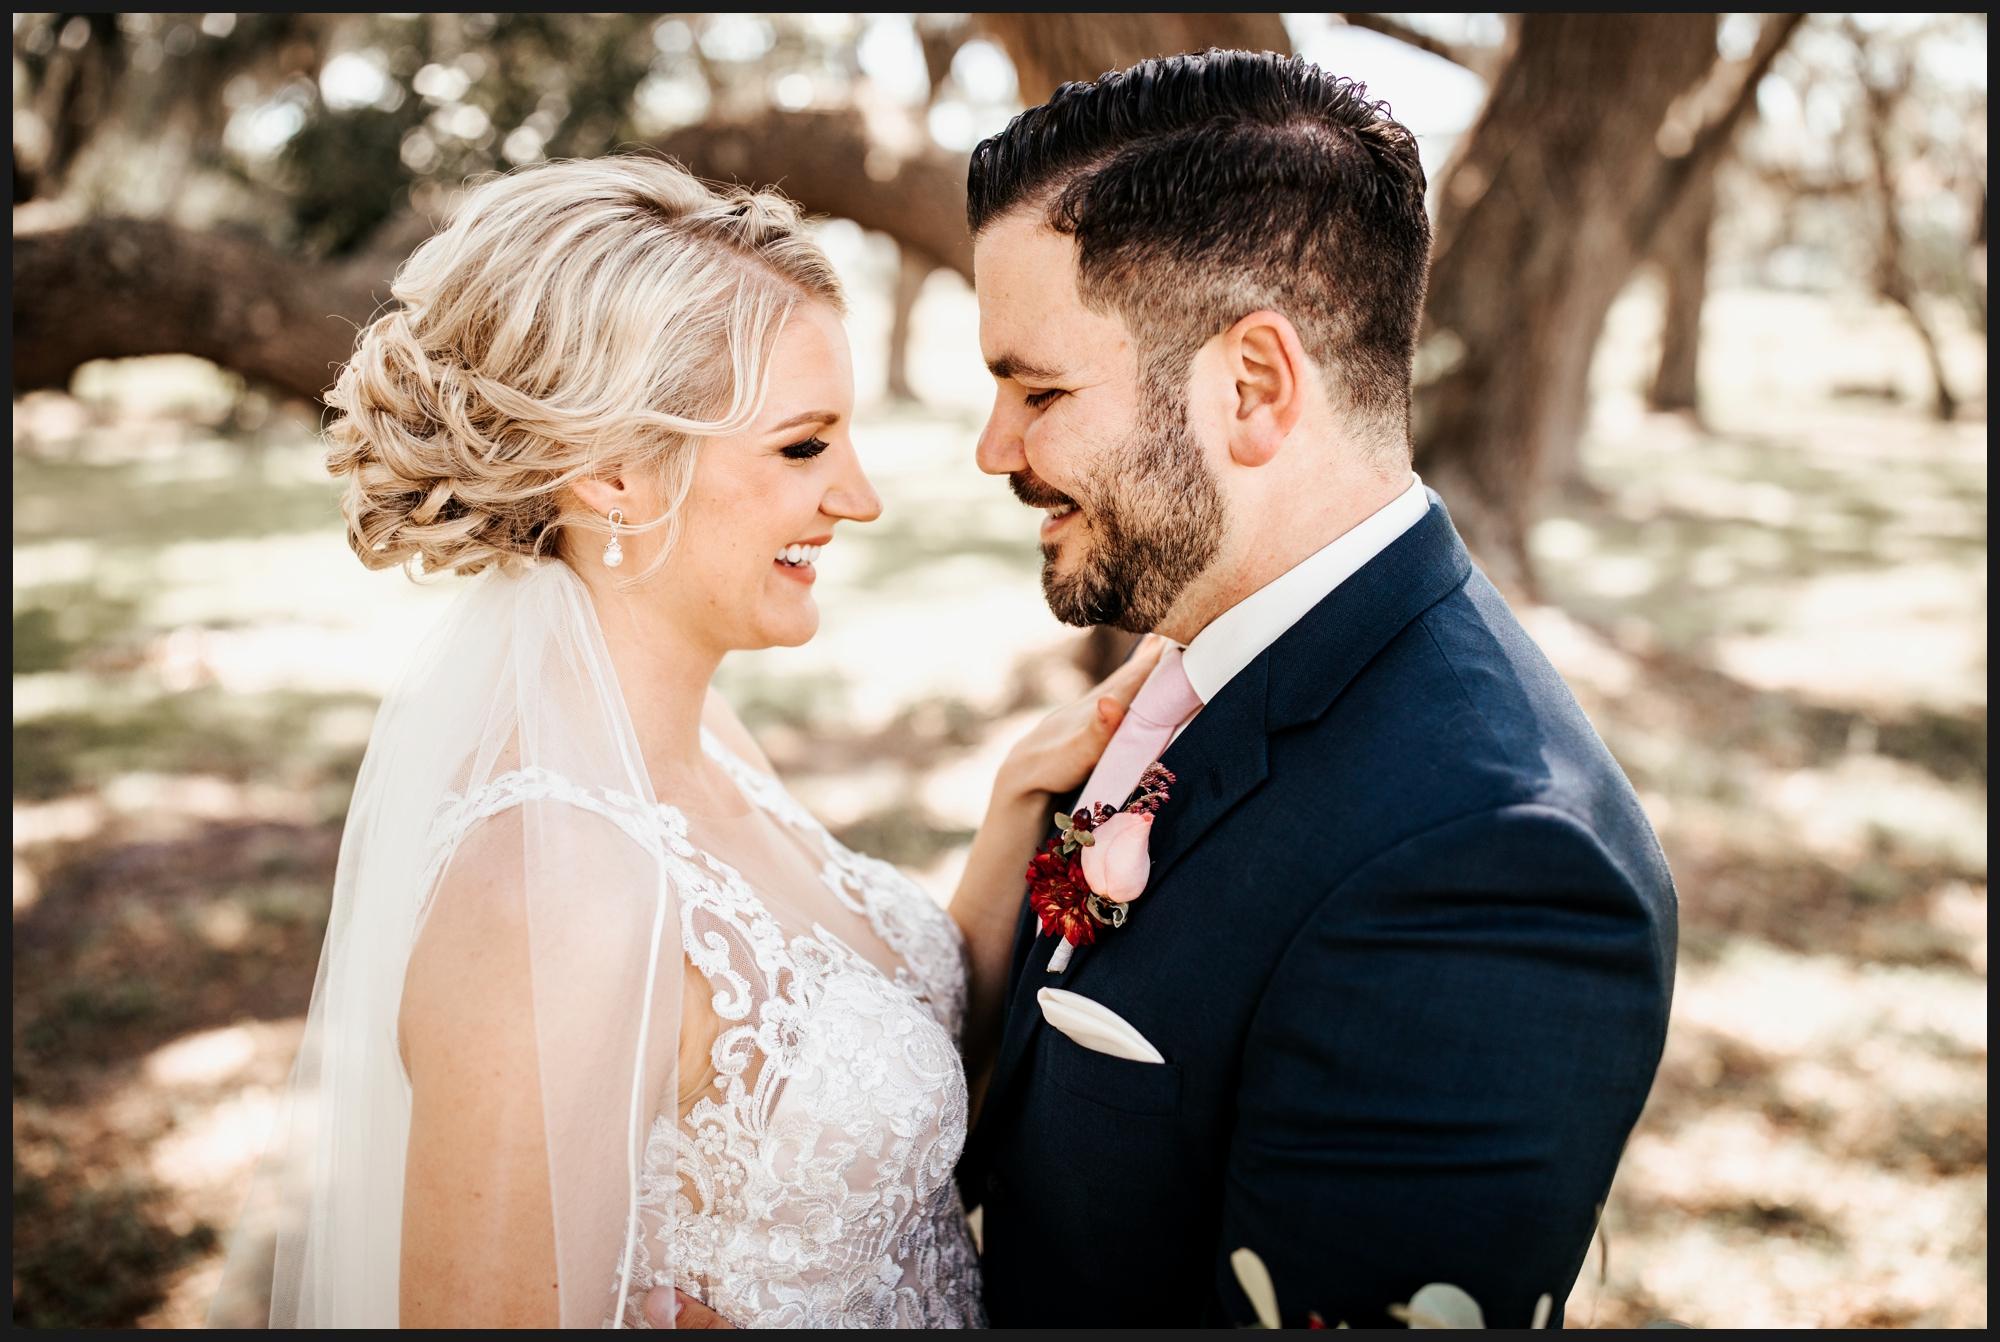 Orlando-Wedding-Photographer-destination-wedding-photographer-florida-wedding-photographer-hawaii-wedding-photographer_0577.jpg